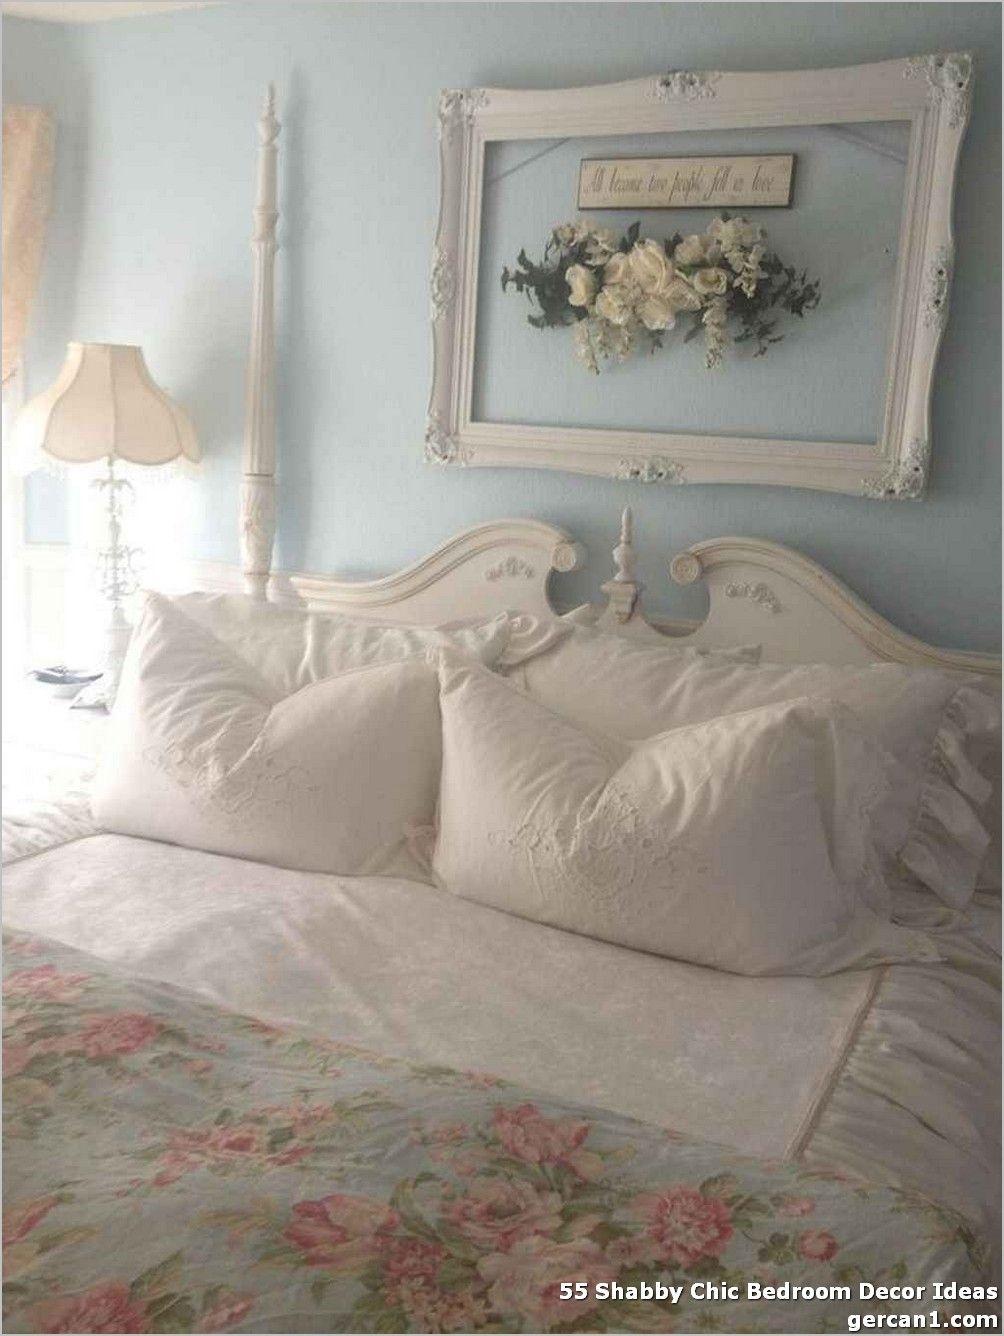 Diy Shabby Chic Decor diy shabby chic bedroom - easy craft ideas